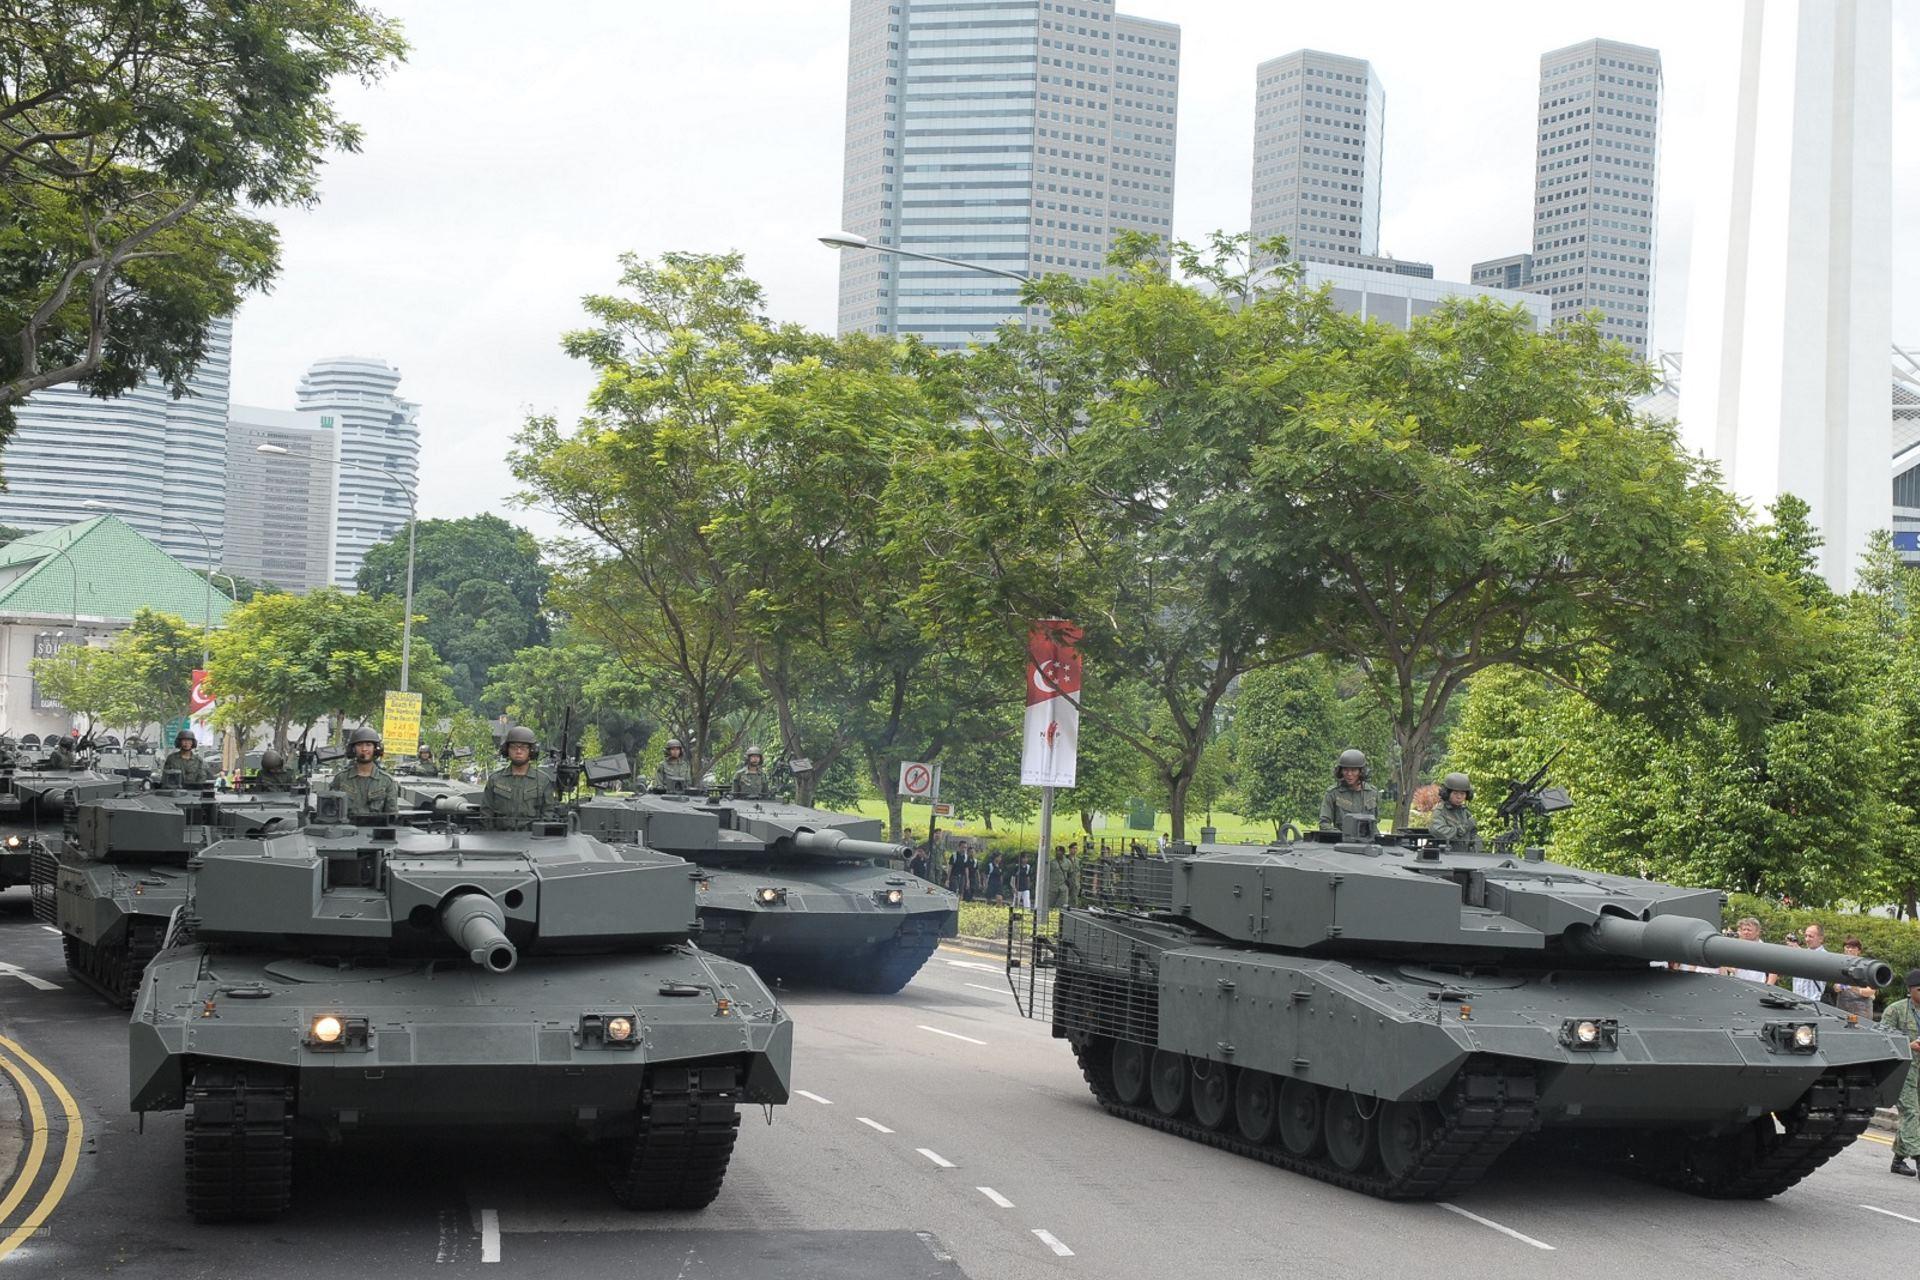 PIONEER - NDP 2019 celebrates the Singapore story